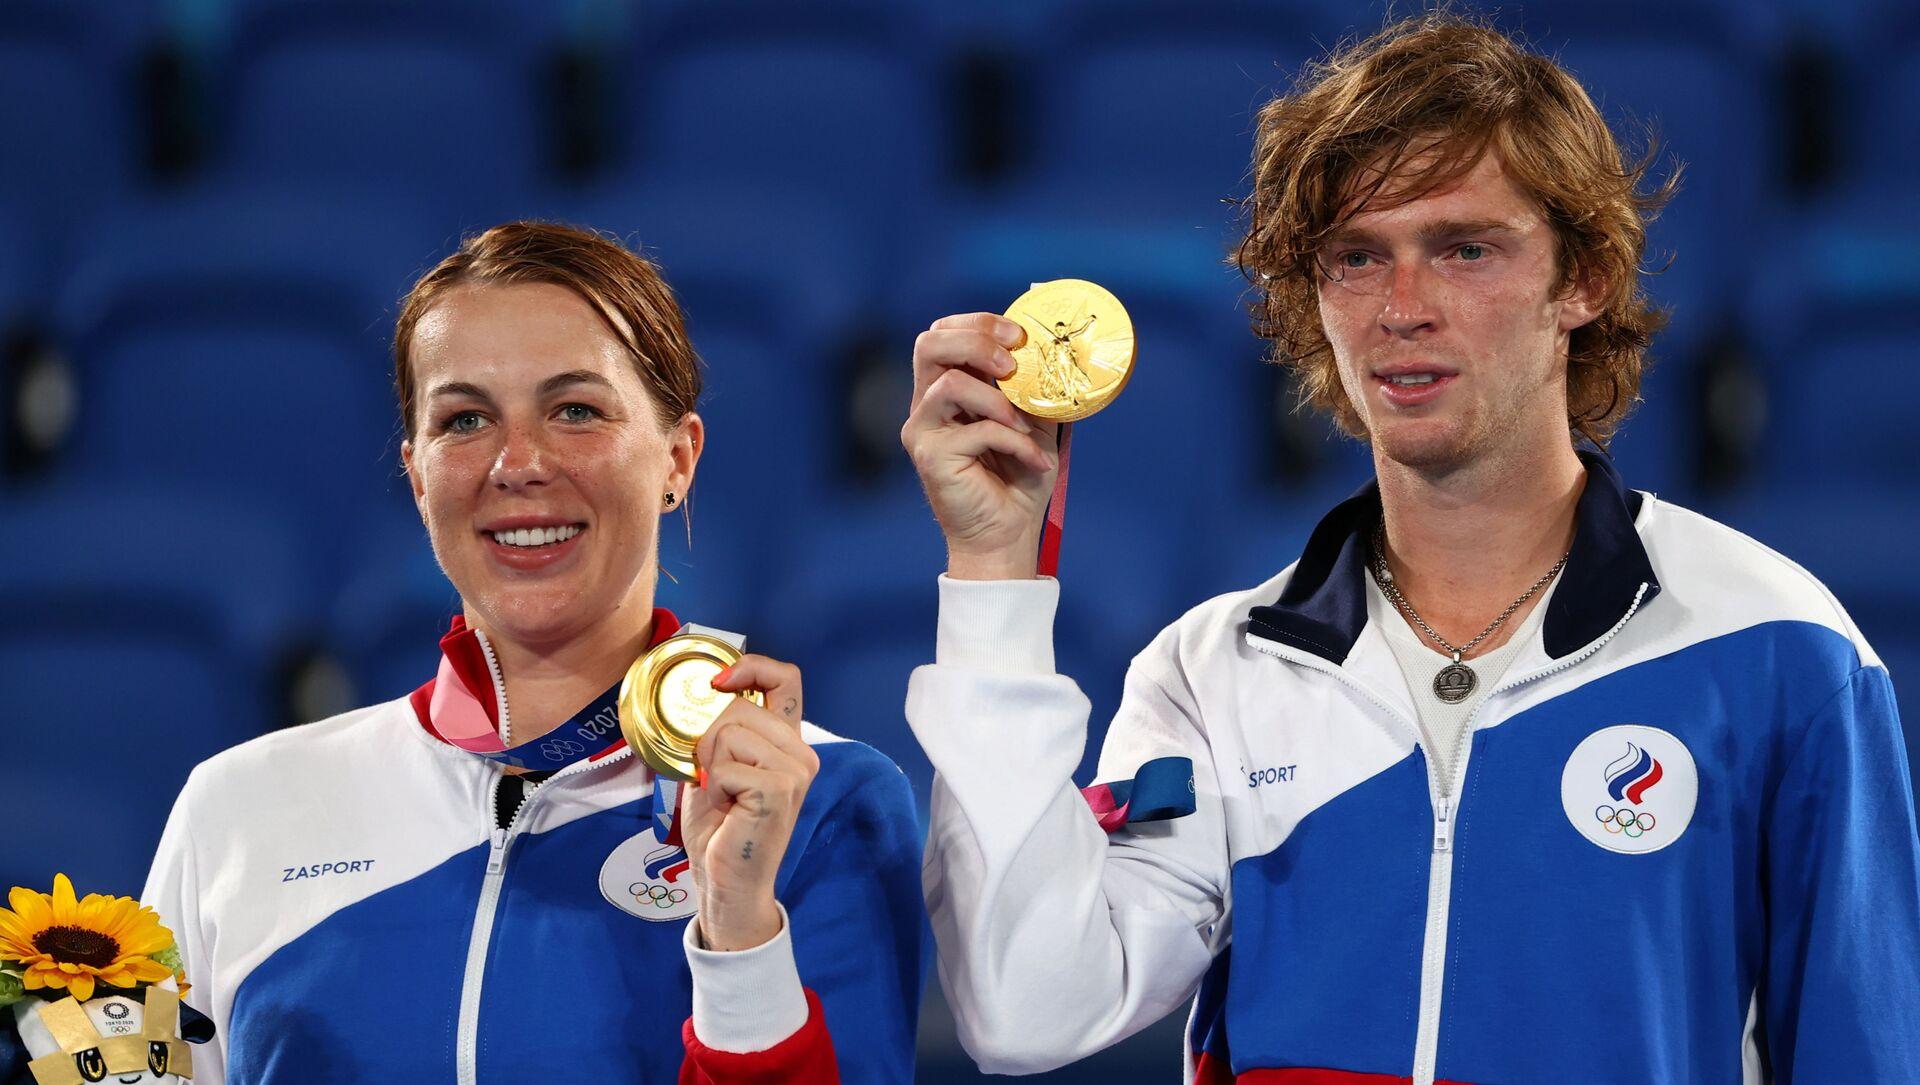 old medallists Anastasia Pavlyuchenkova and Andrey Rublev of the Russian Olympic Committee on the podium REUTERS/Stoyan Nenov - Sputnik International, 1920, 01.08.2021